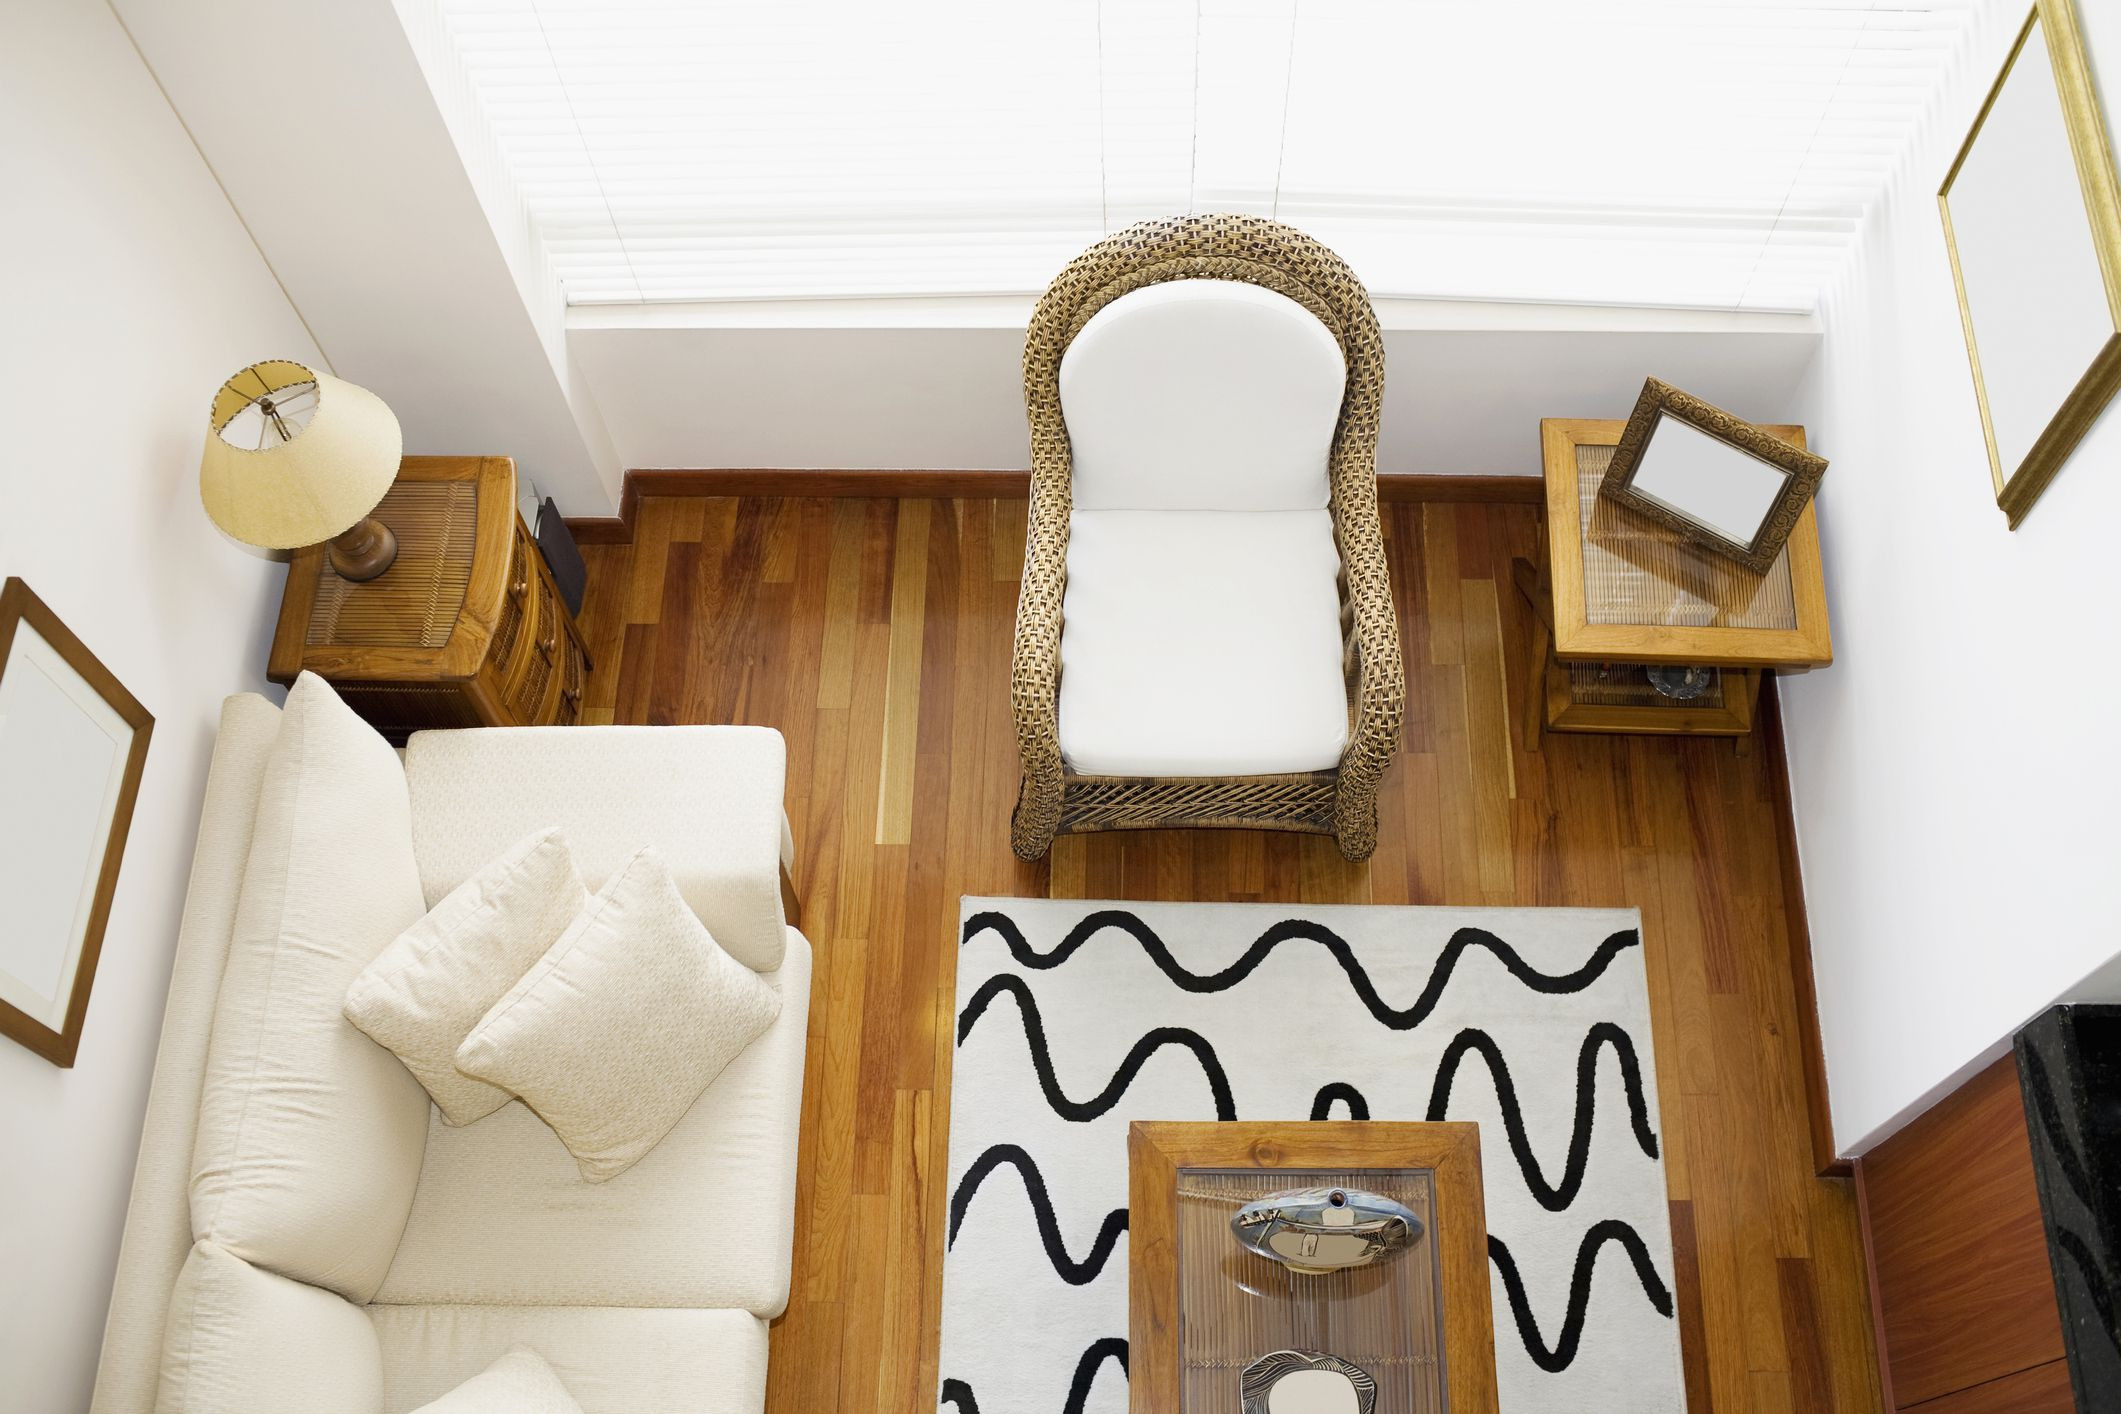 hardwood floor sofa protector of stop putting hardwood floors in every room with 1480712606 hardwood floor rug